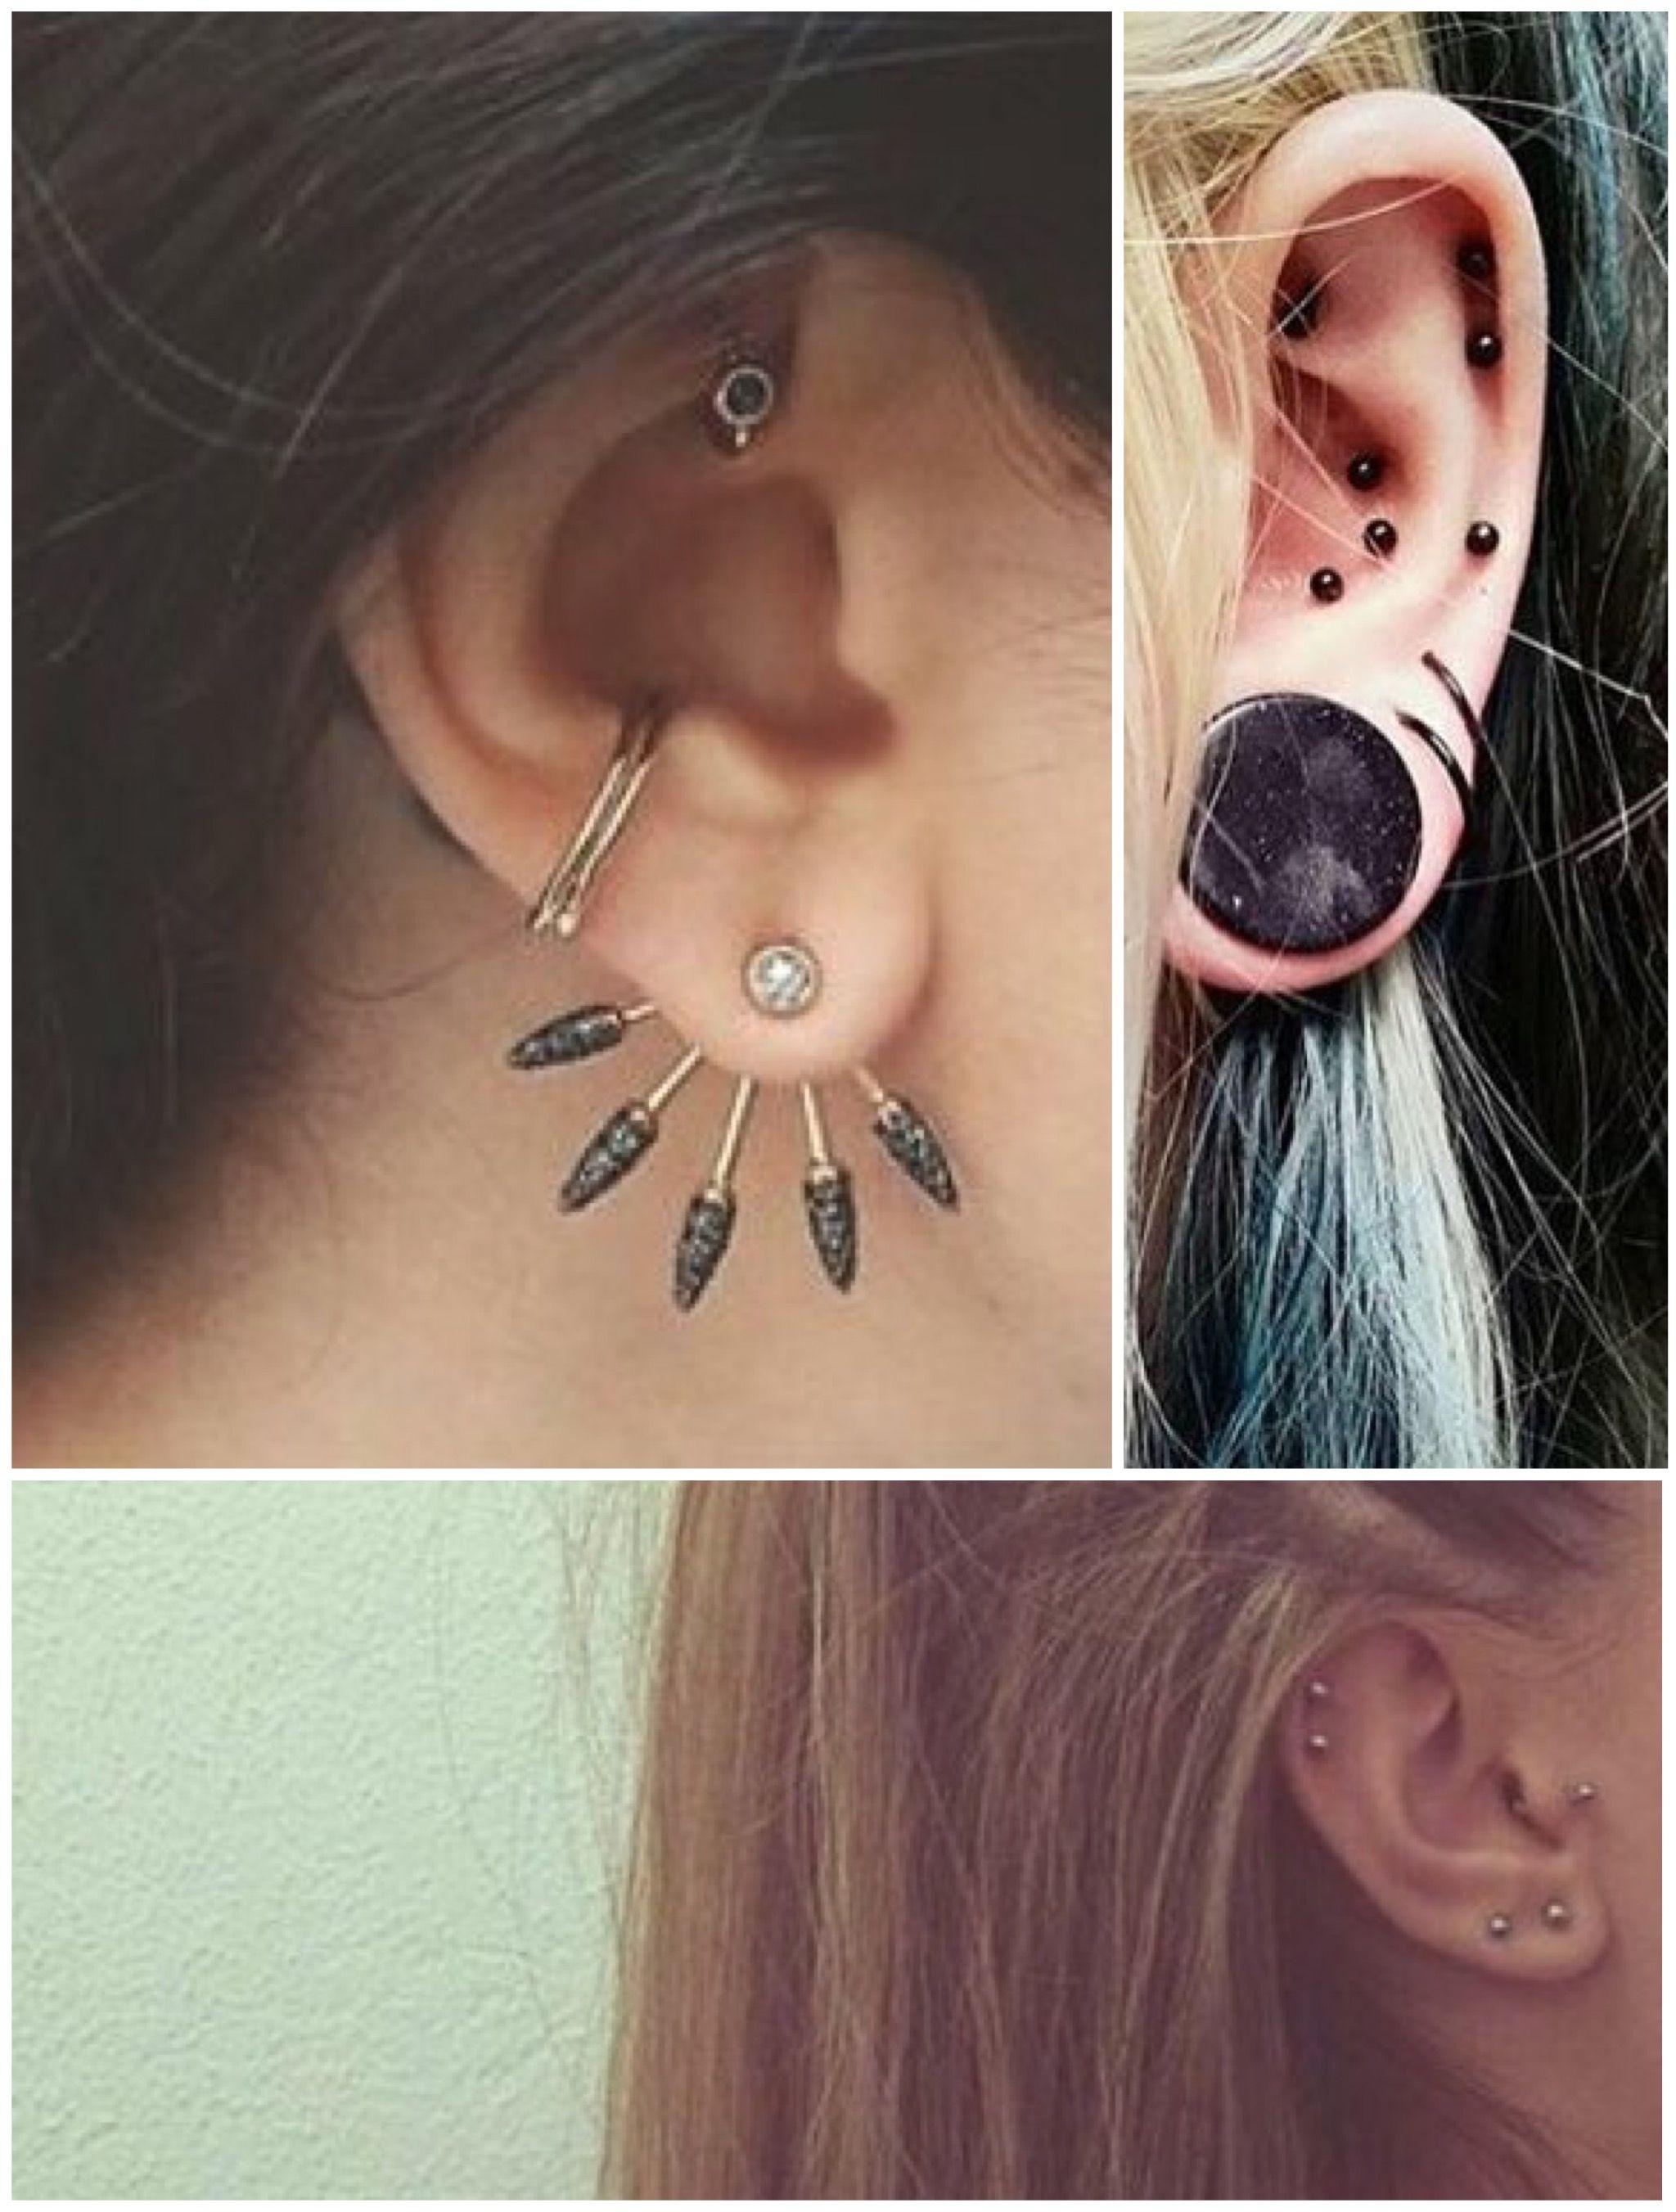 Nose piercing day 3  Pin by Kendra Ebach on Piercings  Pinterest  Piercings